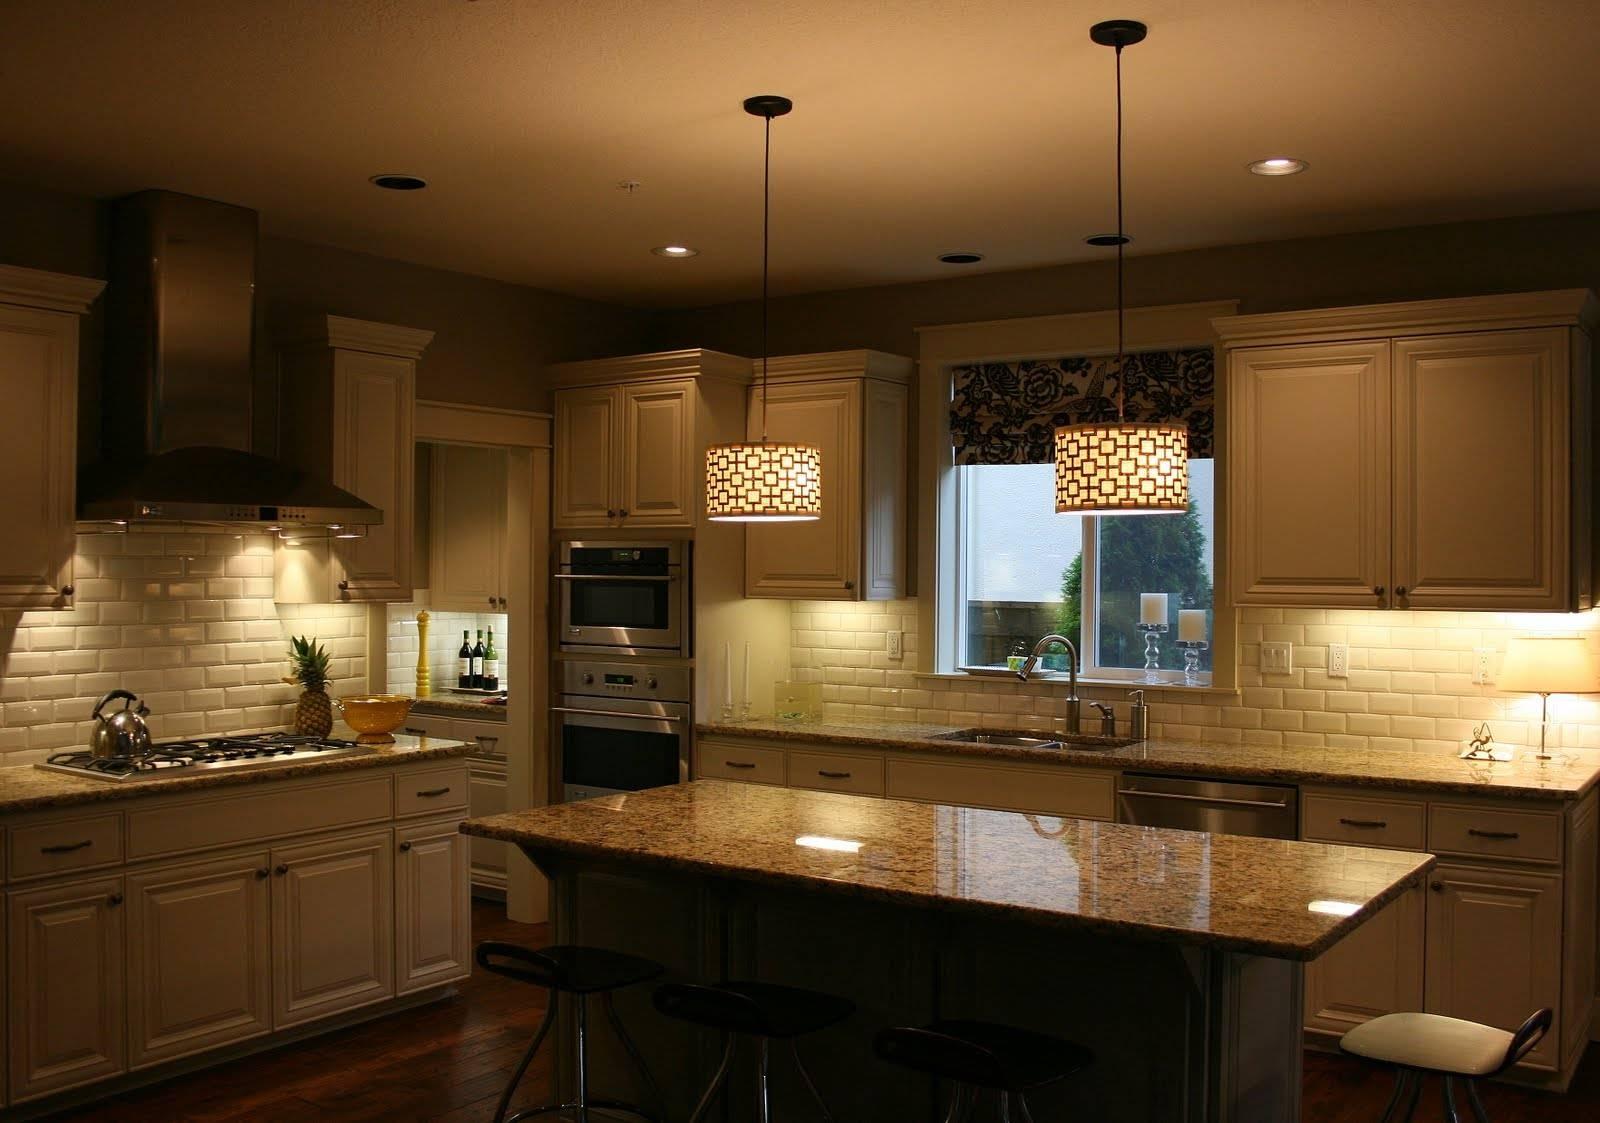 Kitchen : Best Kitchen Lighting Kitchen Ceiling Spotlights Single with Mini Pendant Lights for Kitchen (Image 5 of 15)